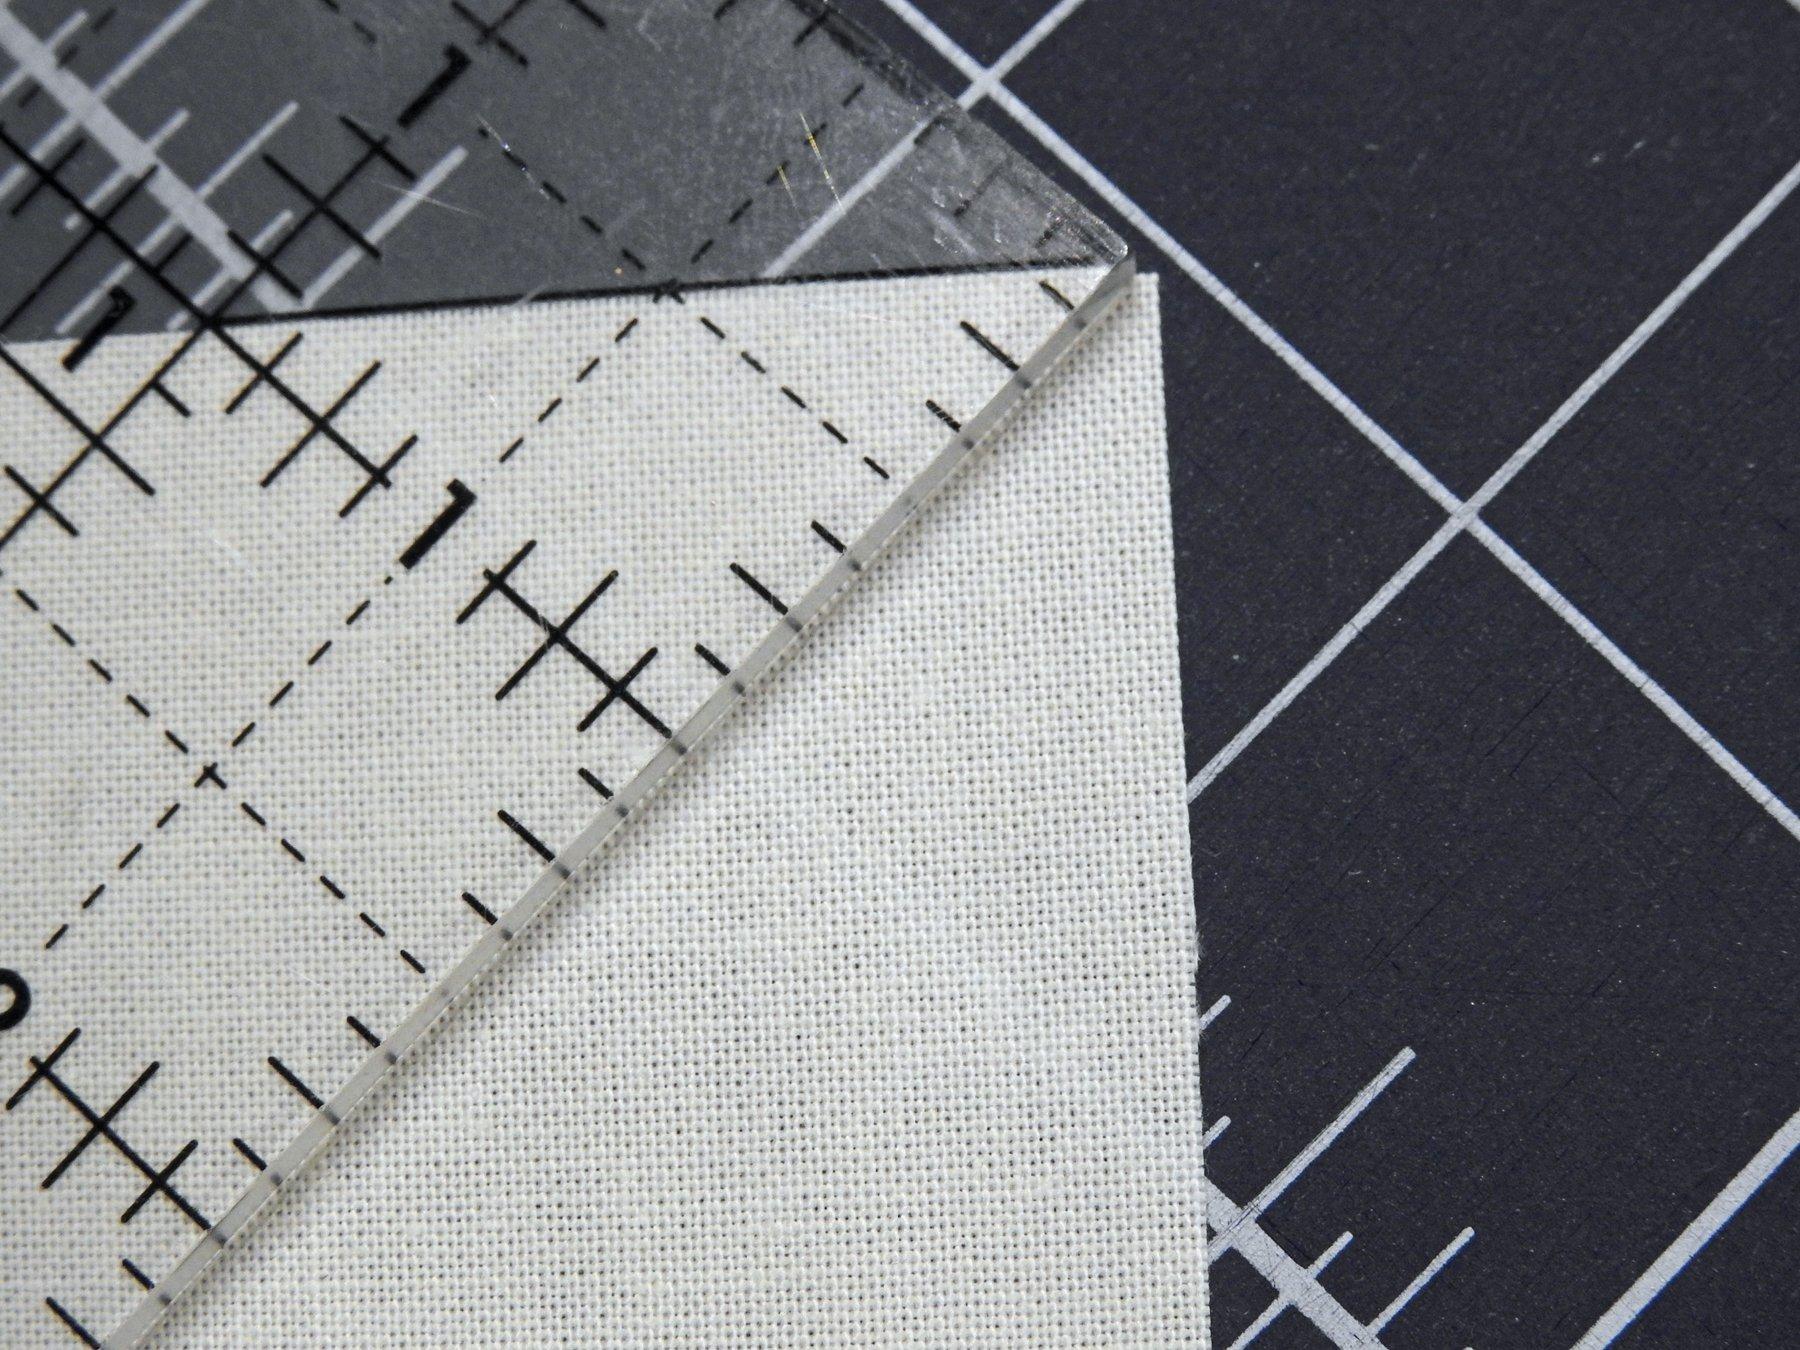 Nudge Ruler When Cutting Squares Diagonally - Detail